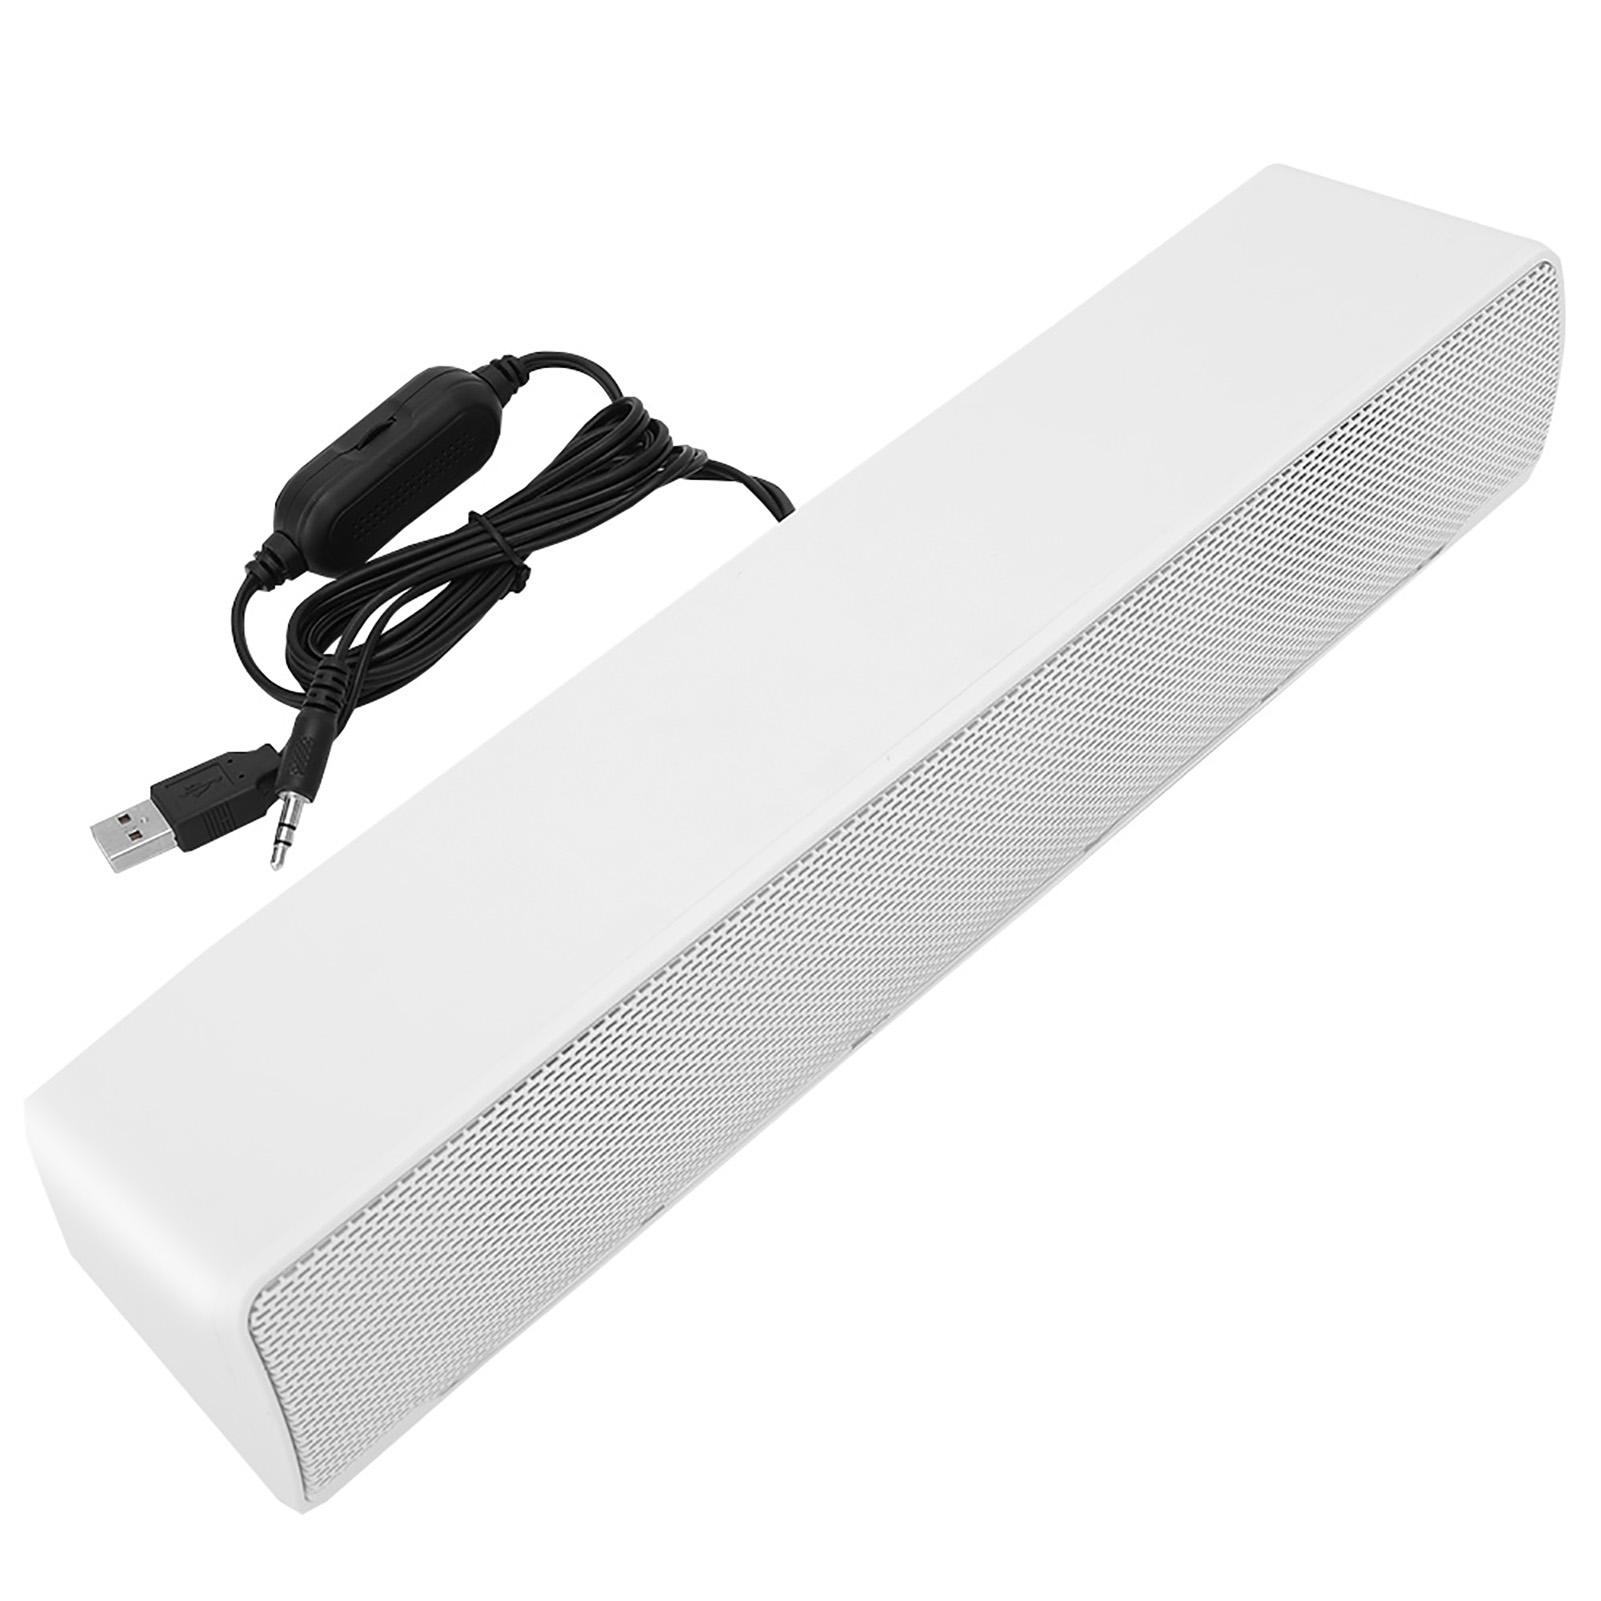 SADA V-196 3D Bluetooth Wireless TV Sound Bar Speaker USB Home Theater Subwoofer